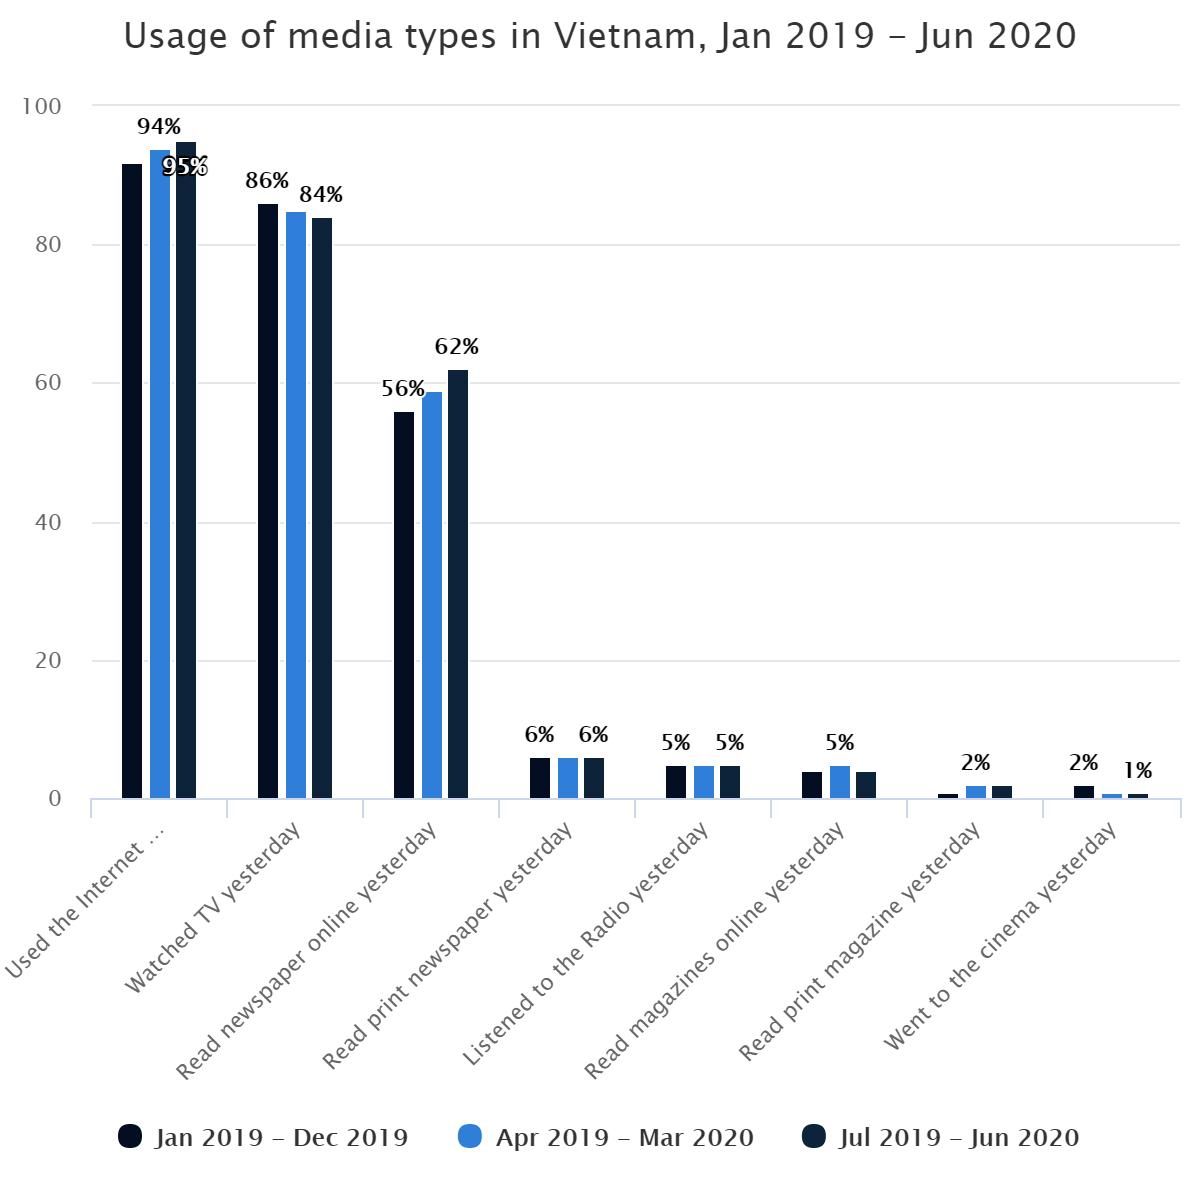 Usage of media types in Vietnam, Jan 2019 – Jun 2020